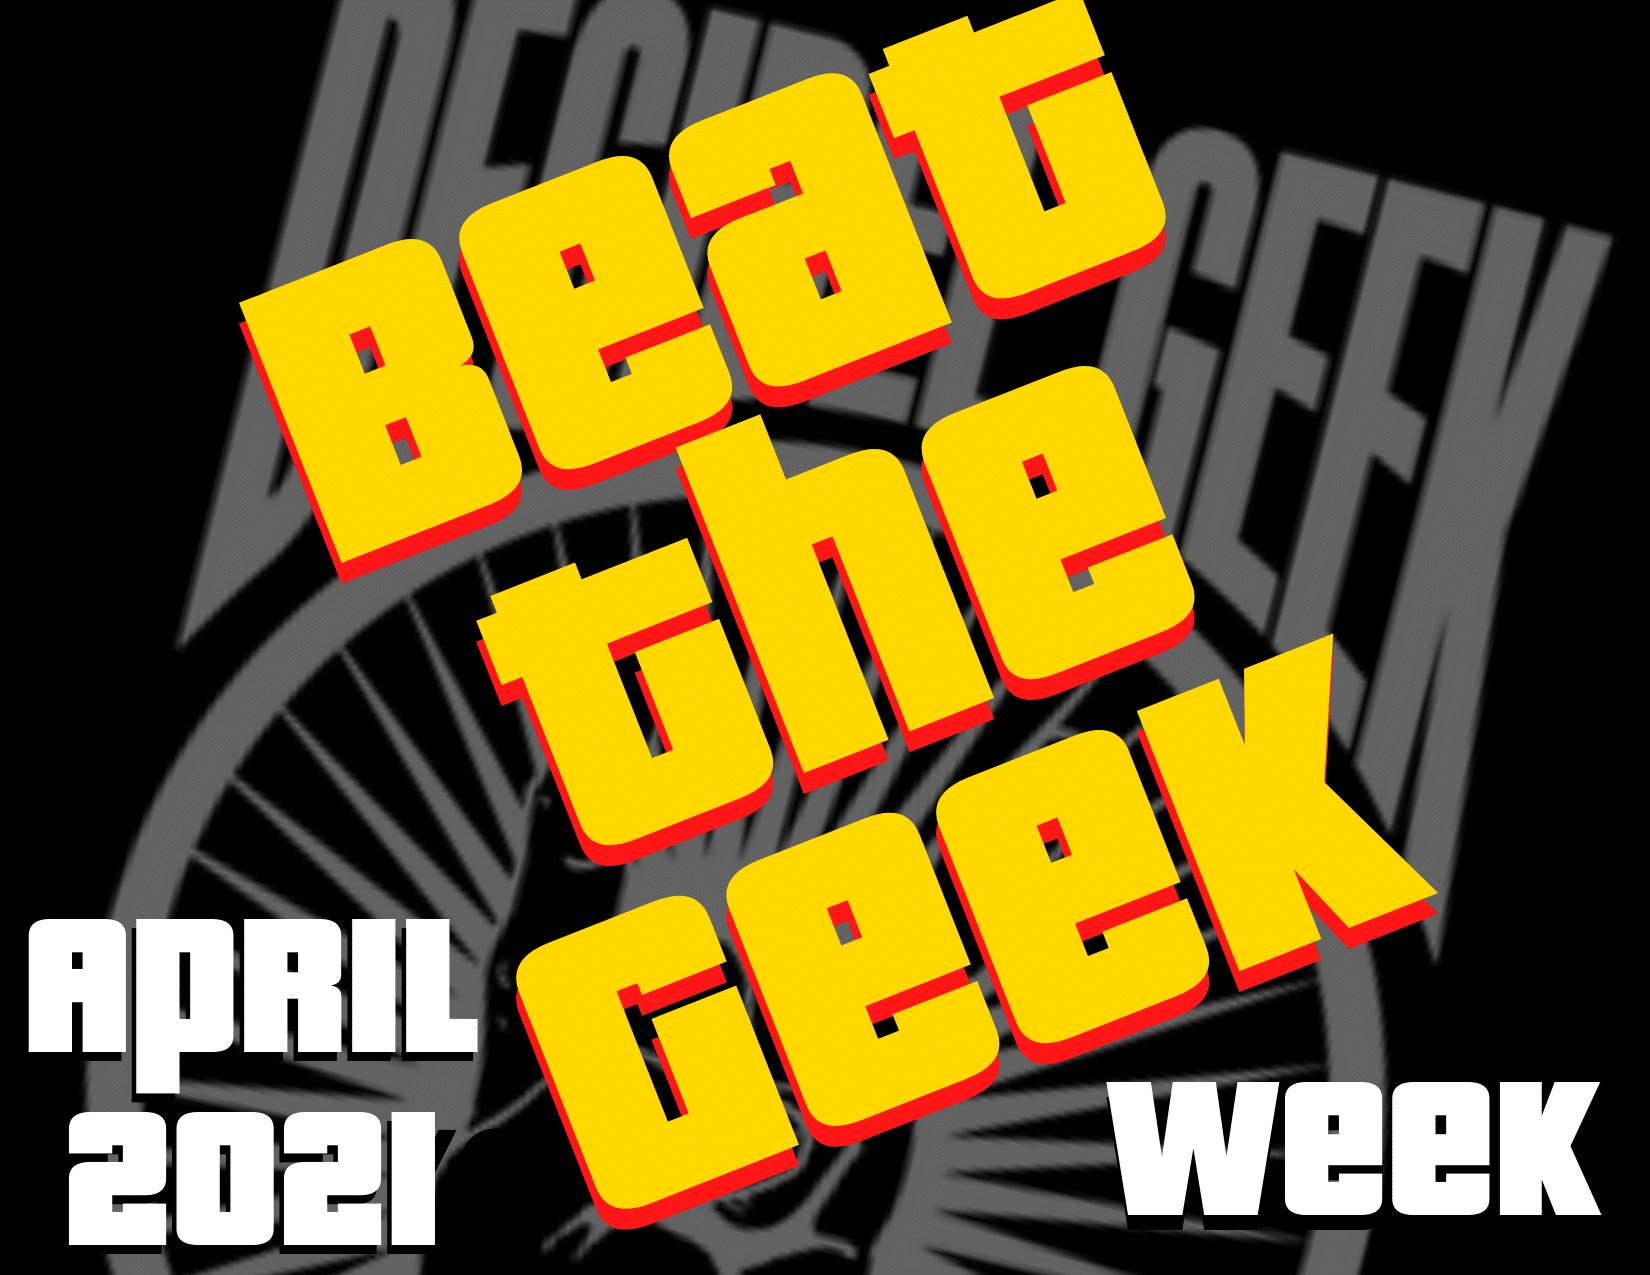 Beat the Geek Week, rock, metal, triva, game show